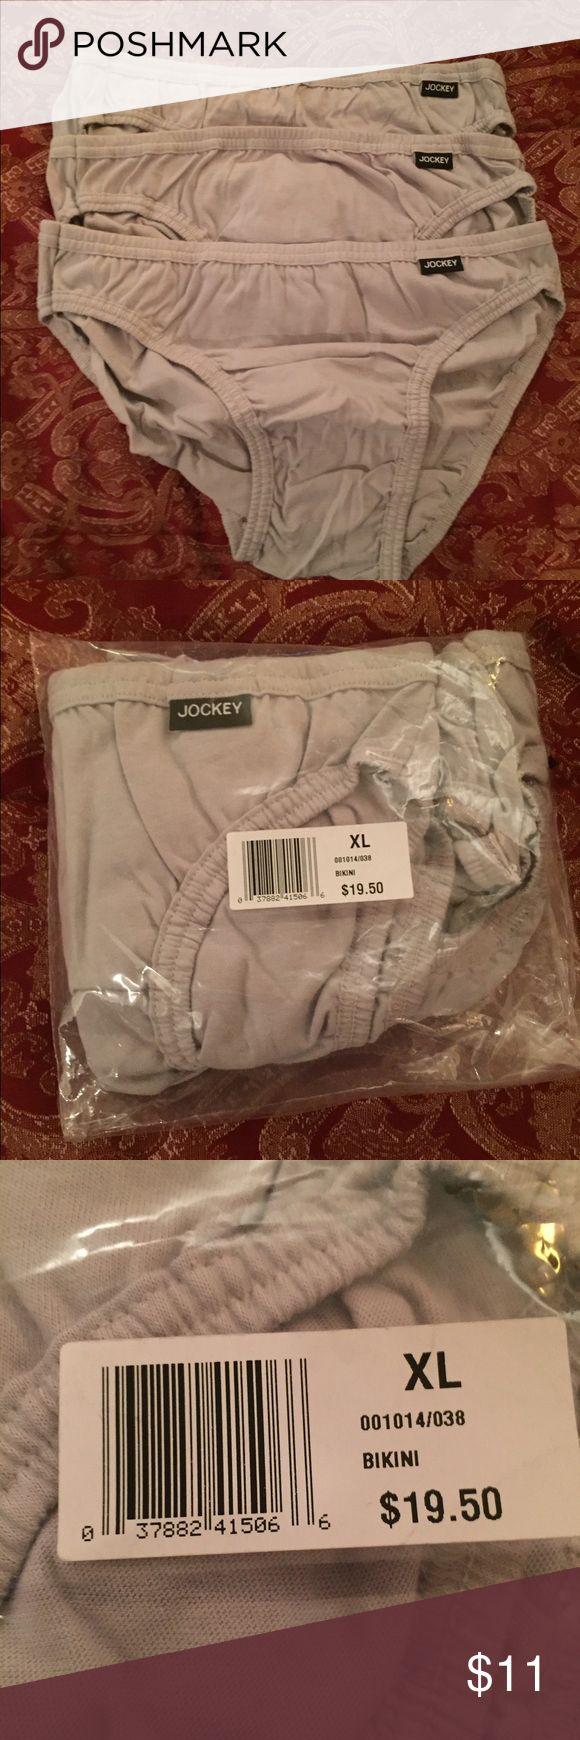 Men's Jockey Elance Bikini Briefs Underwear 3 pack Men's Jockey Elance Bikini Briefs Underwear....3 pack...color Gray...size XL....100% cotton....made in Honduras Jockey Underwear & Socks Briefs